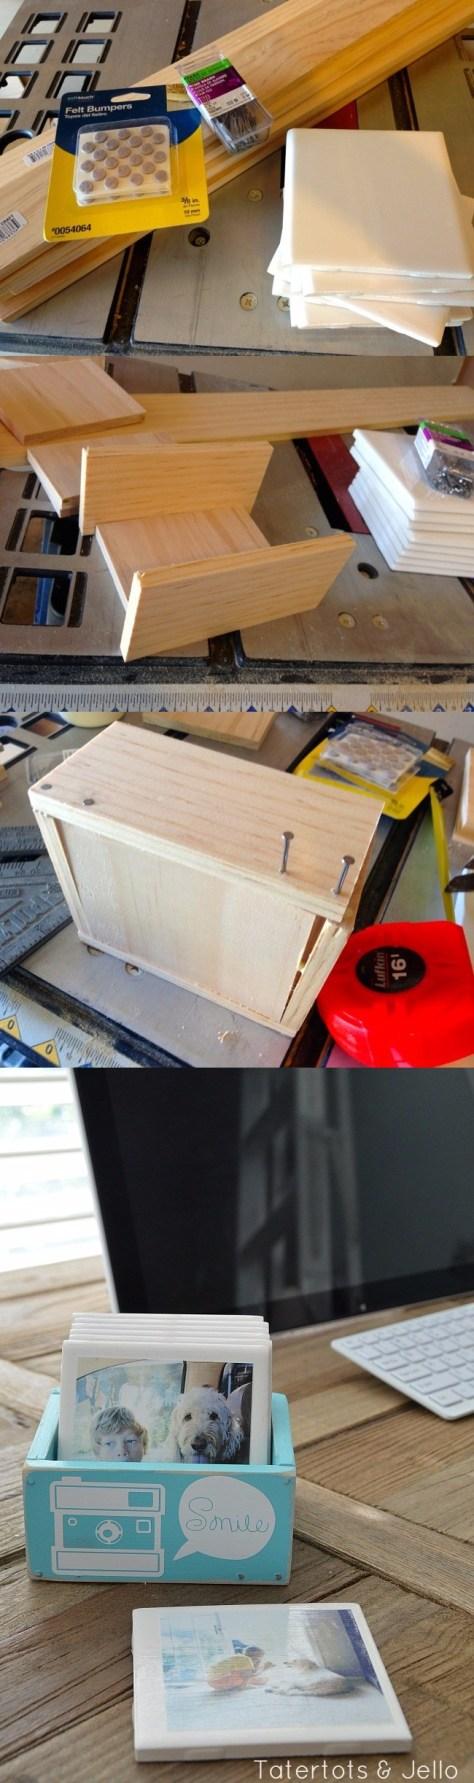 DIY Instagram Coasters in Wooden Box